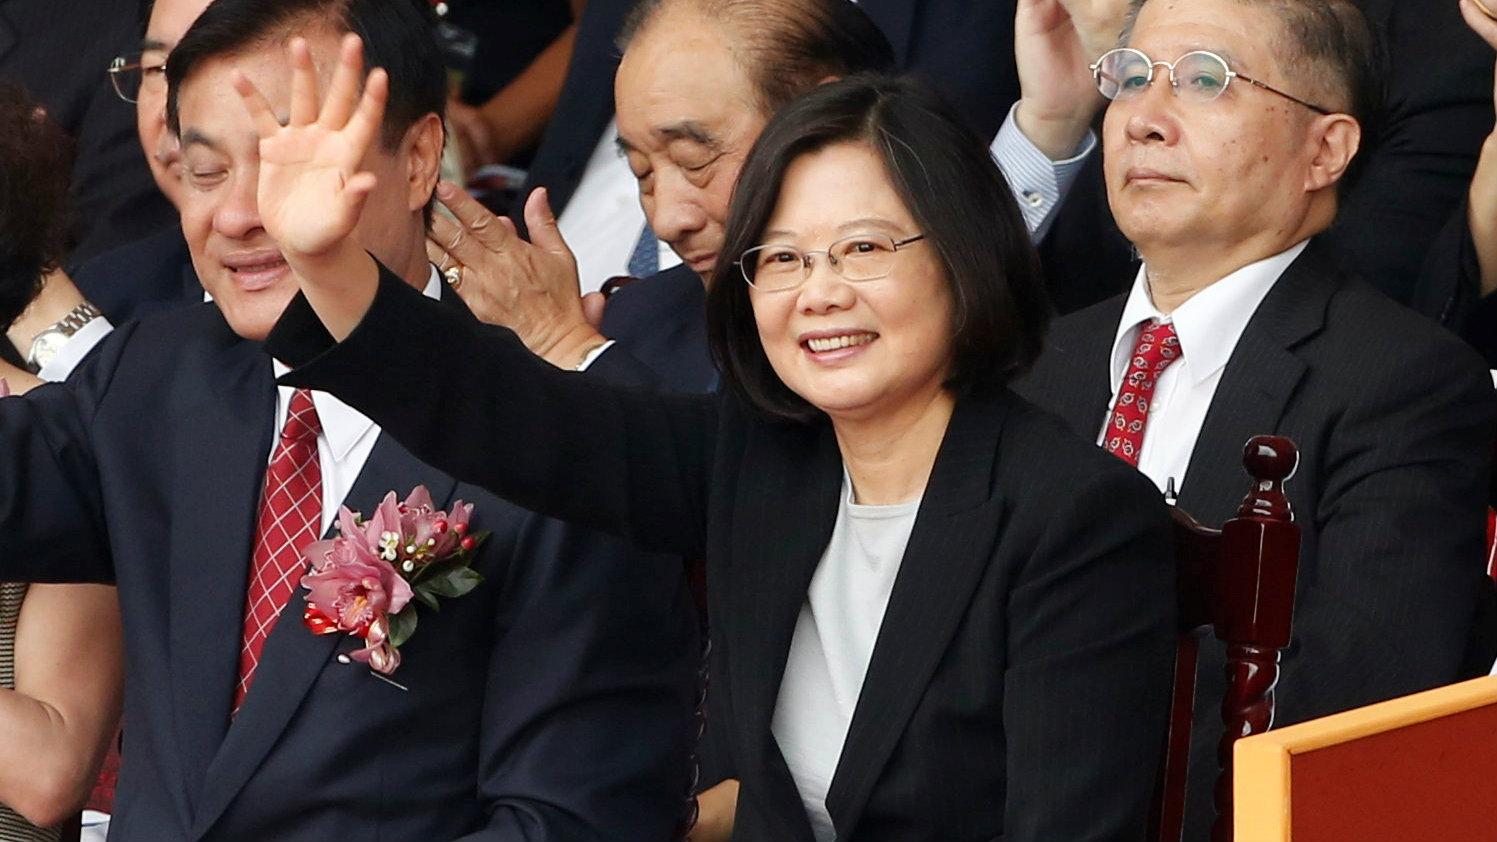 President Tsai Ing-wen waves during National Day celebrations in Taipei, Taiwan, October 10, 2016.